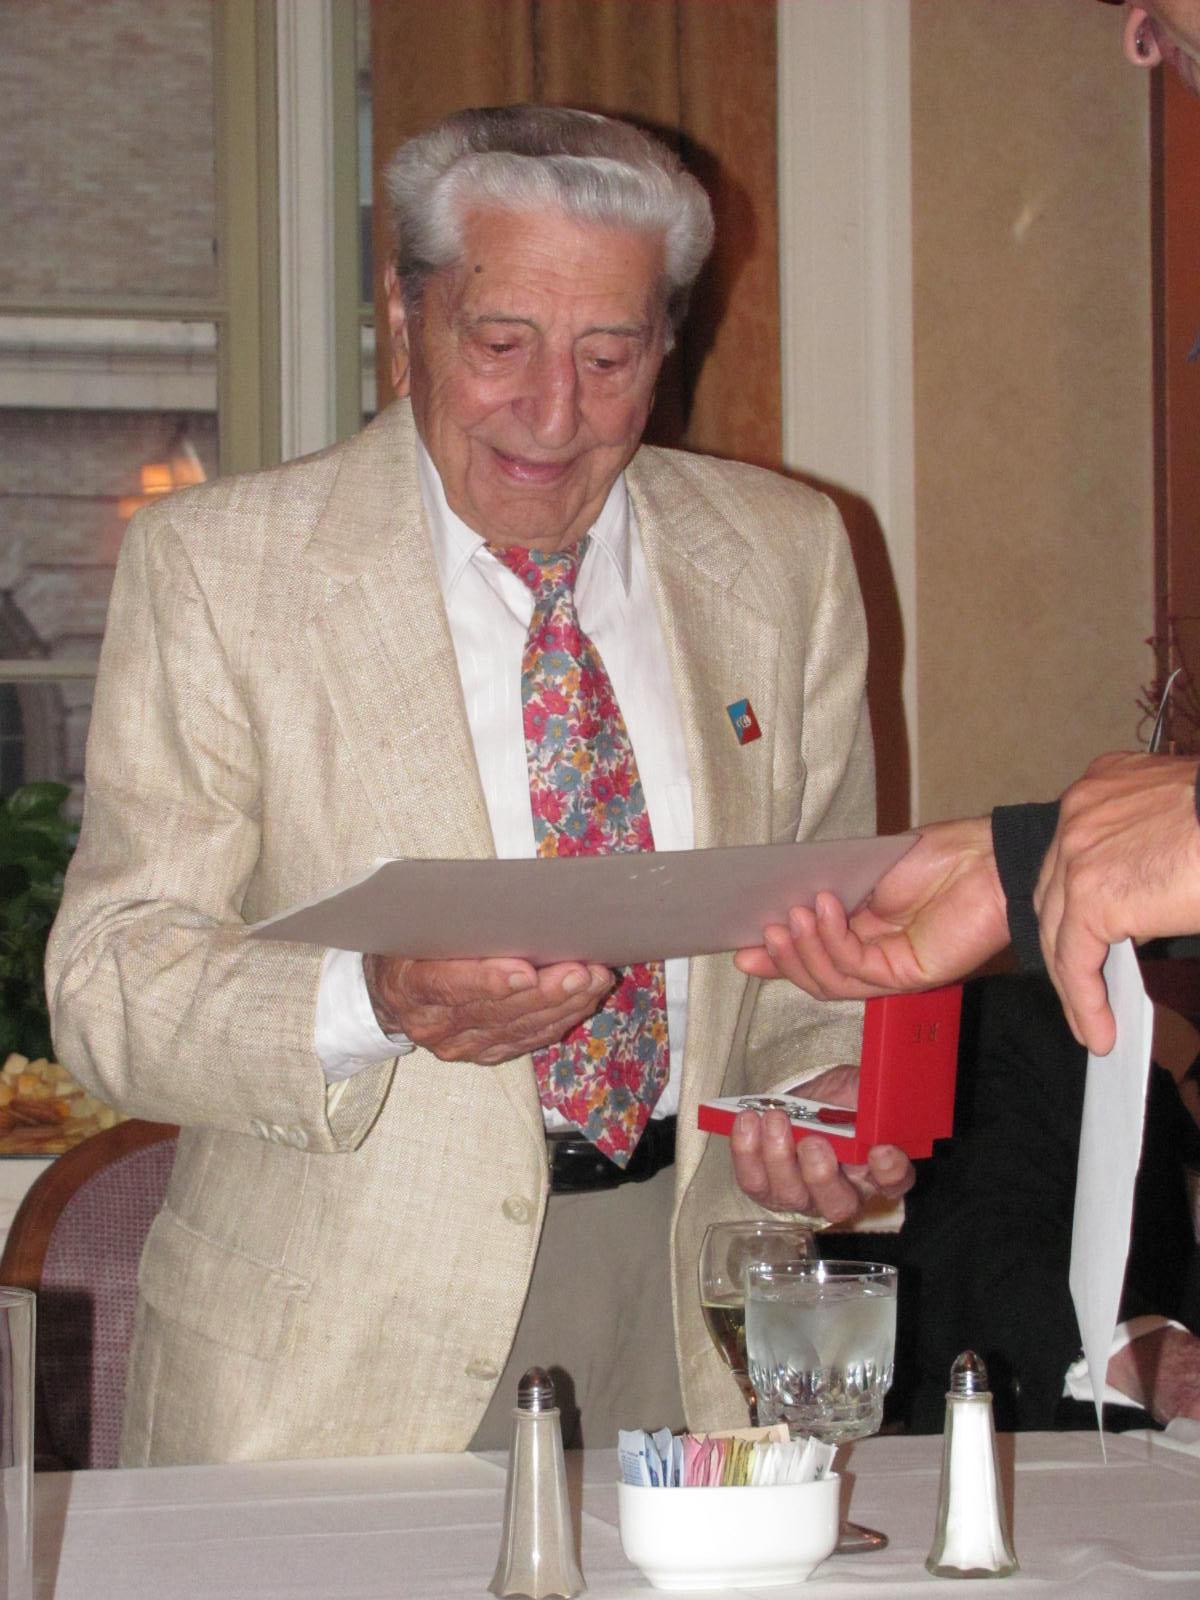 Tony Stefanelli receiving award.jpg